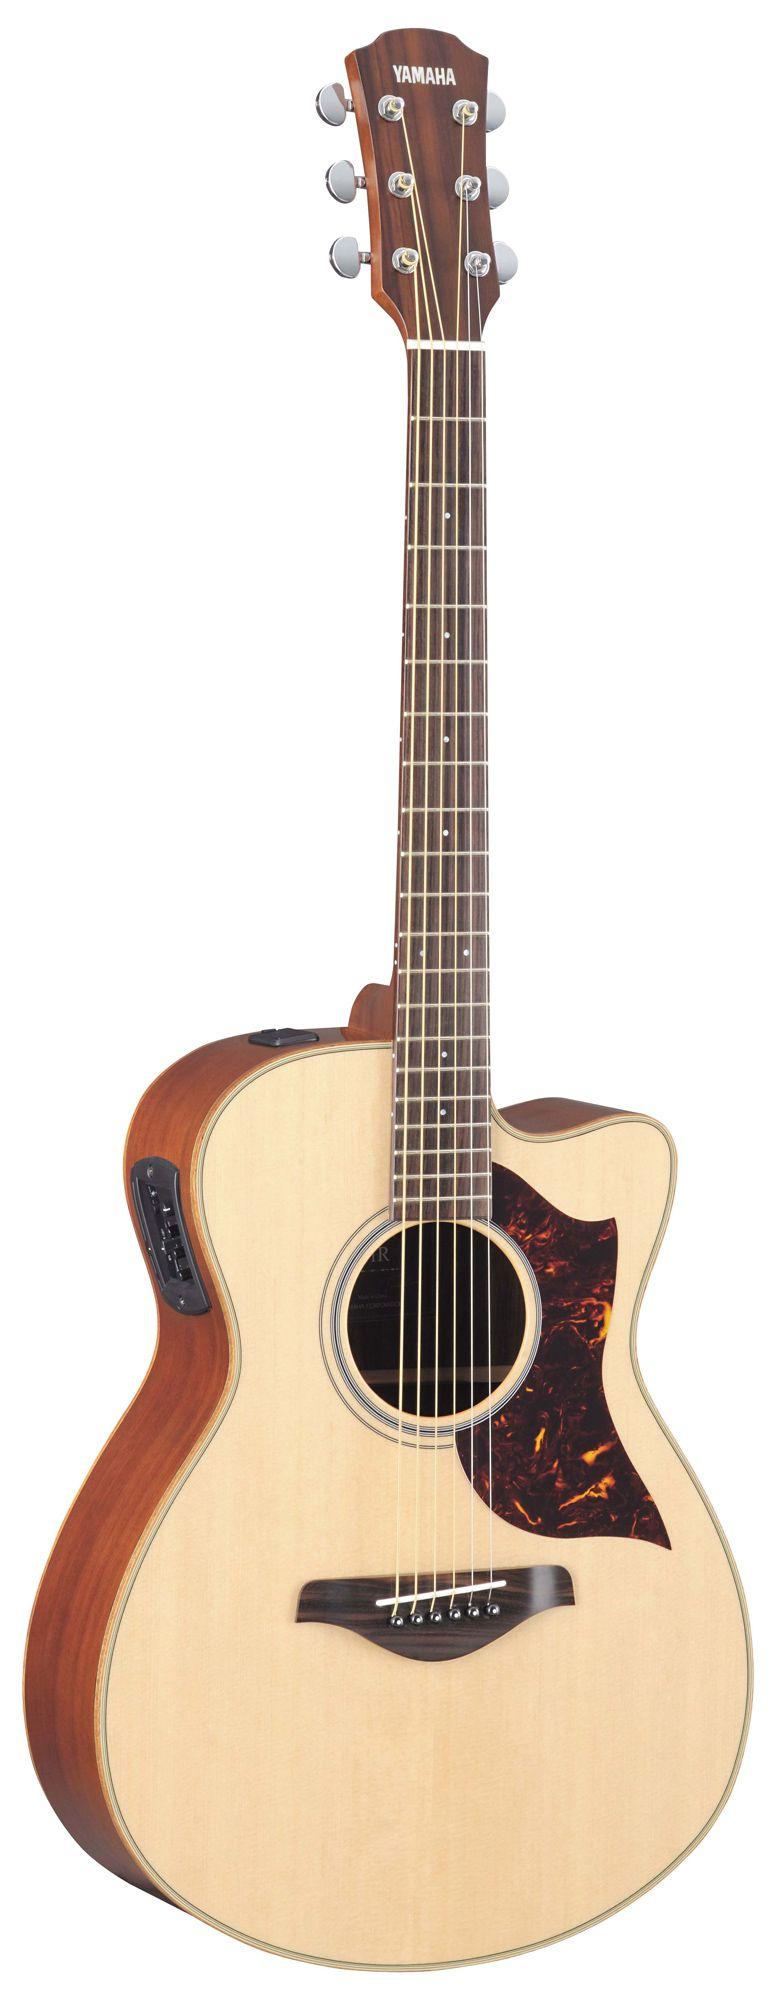 Violão Yamaha AC1M II - Natural